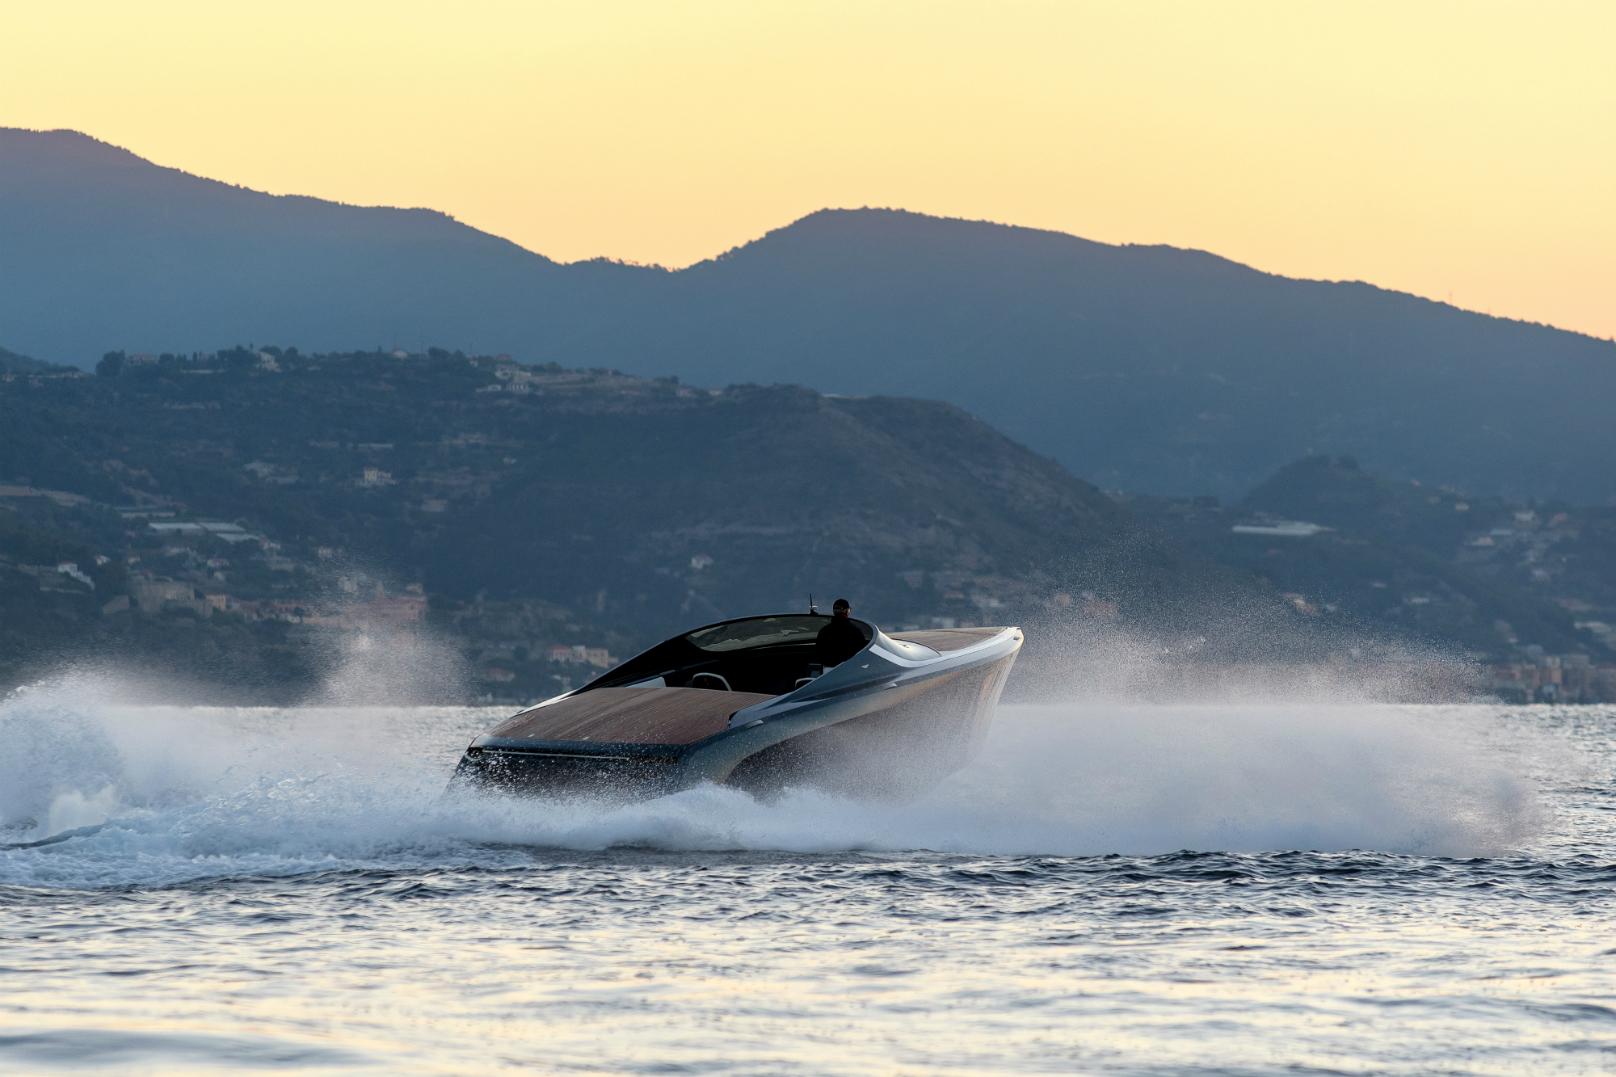 Aston Martin AM37S powerboats